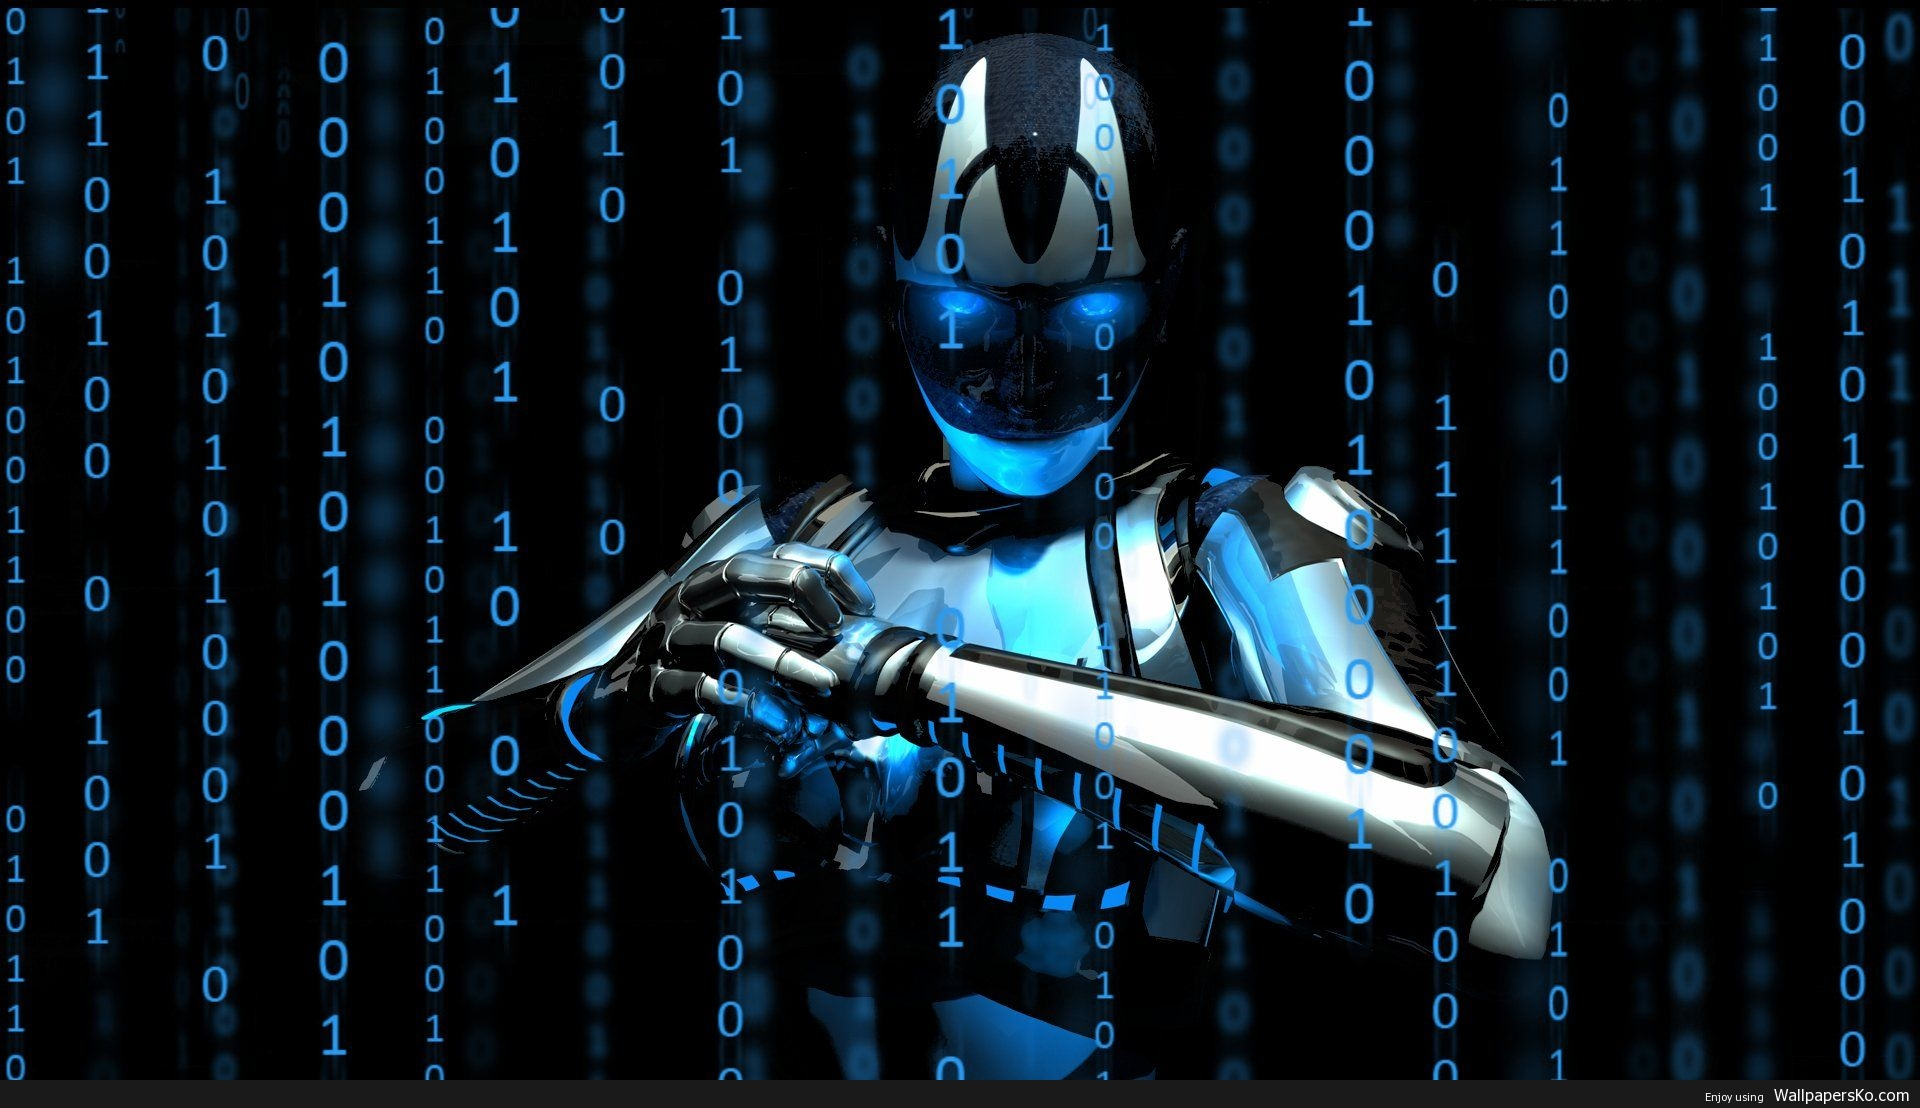 robots hd wallpaper | hd wallpapers download